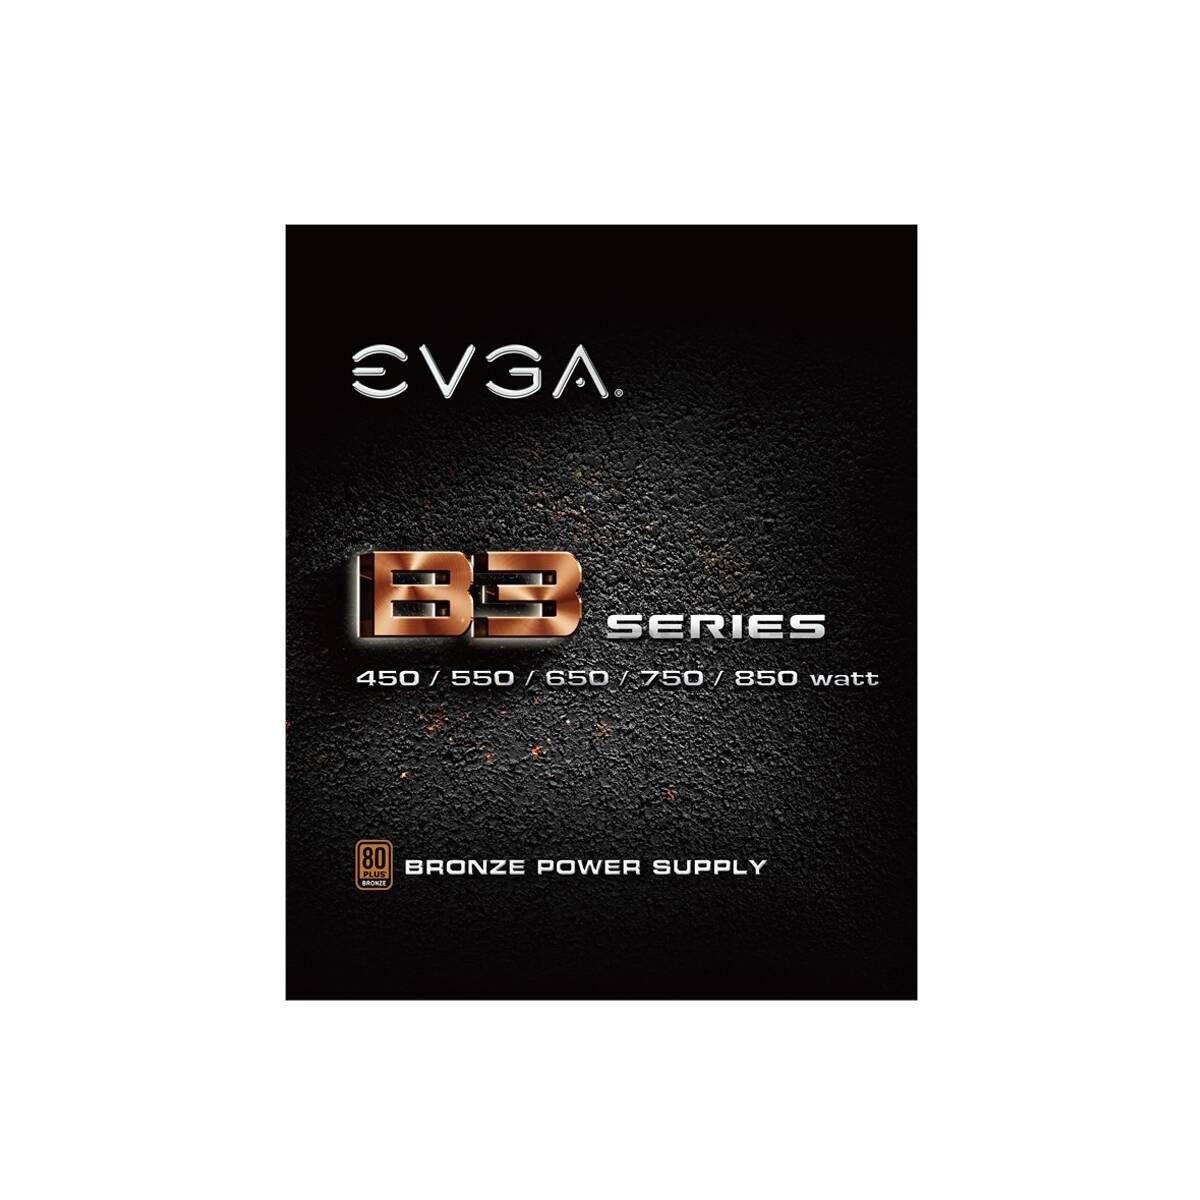 Fuente de alimentaci/ón 220-B3-0750-V2 tama/ño Compacto de 160 mm EVGA 750 B3 Modo EVGA Eco Completamente Modular 80+ Bronce 750W